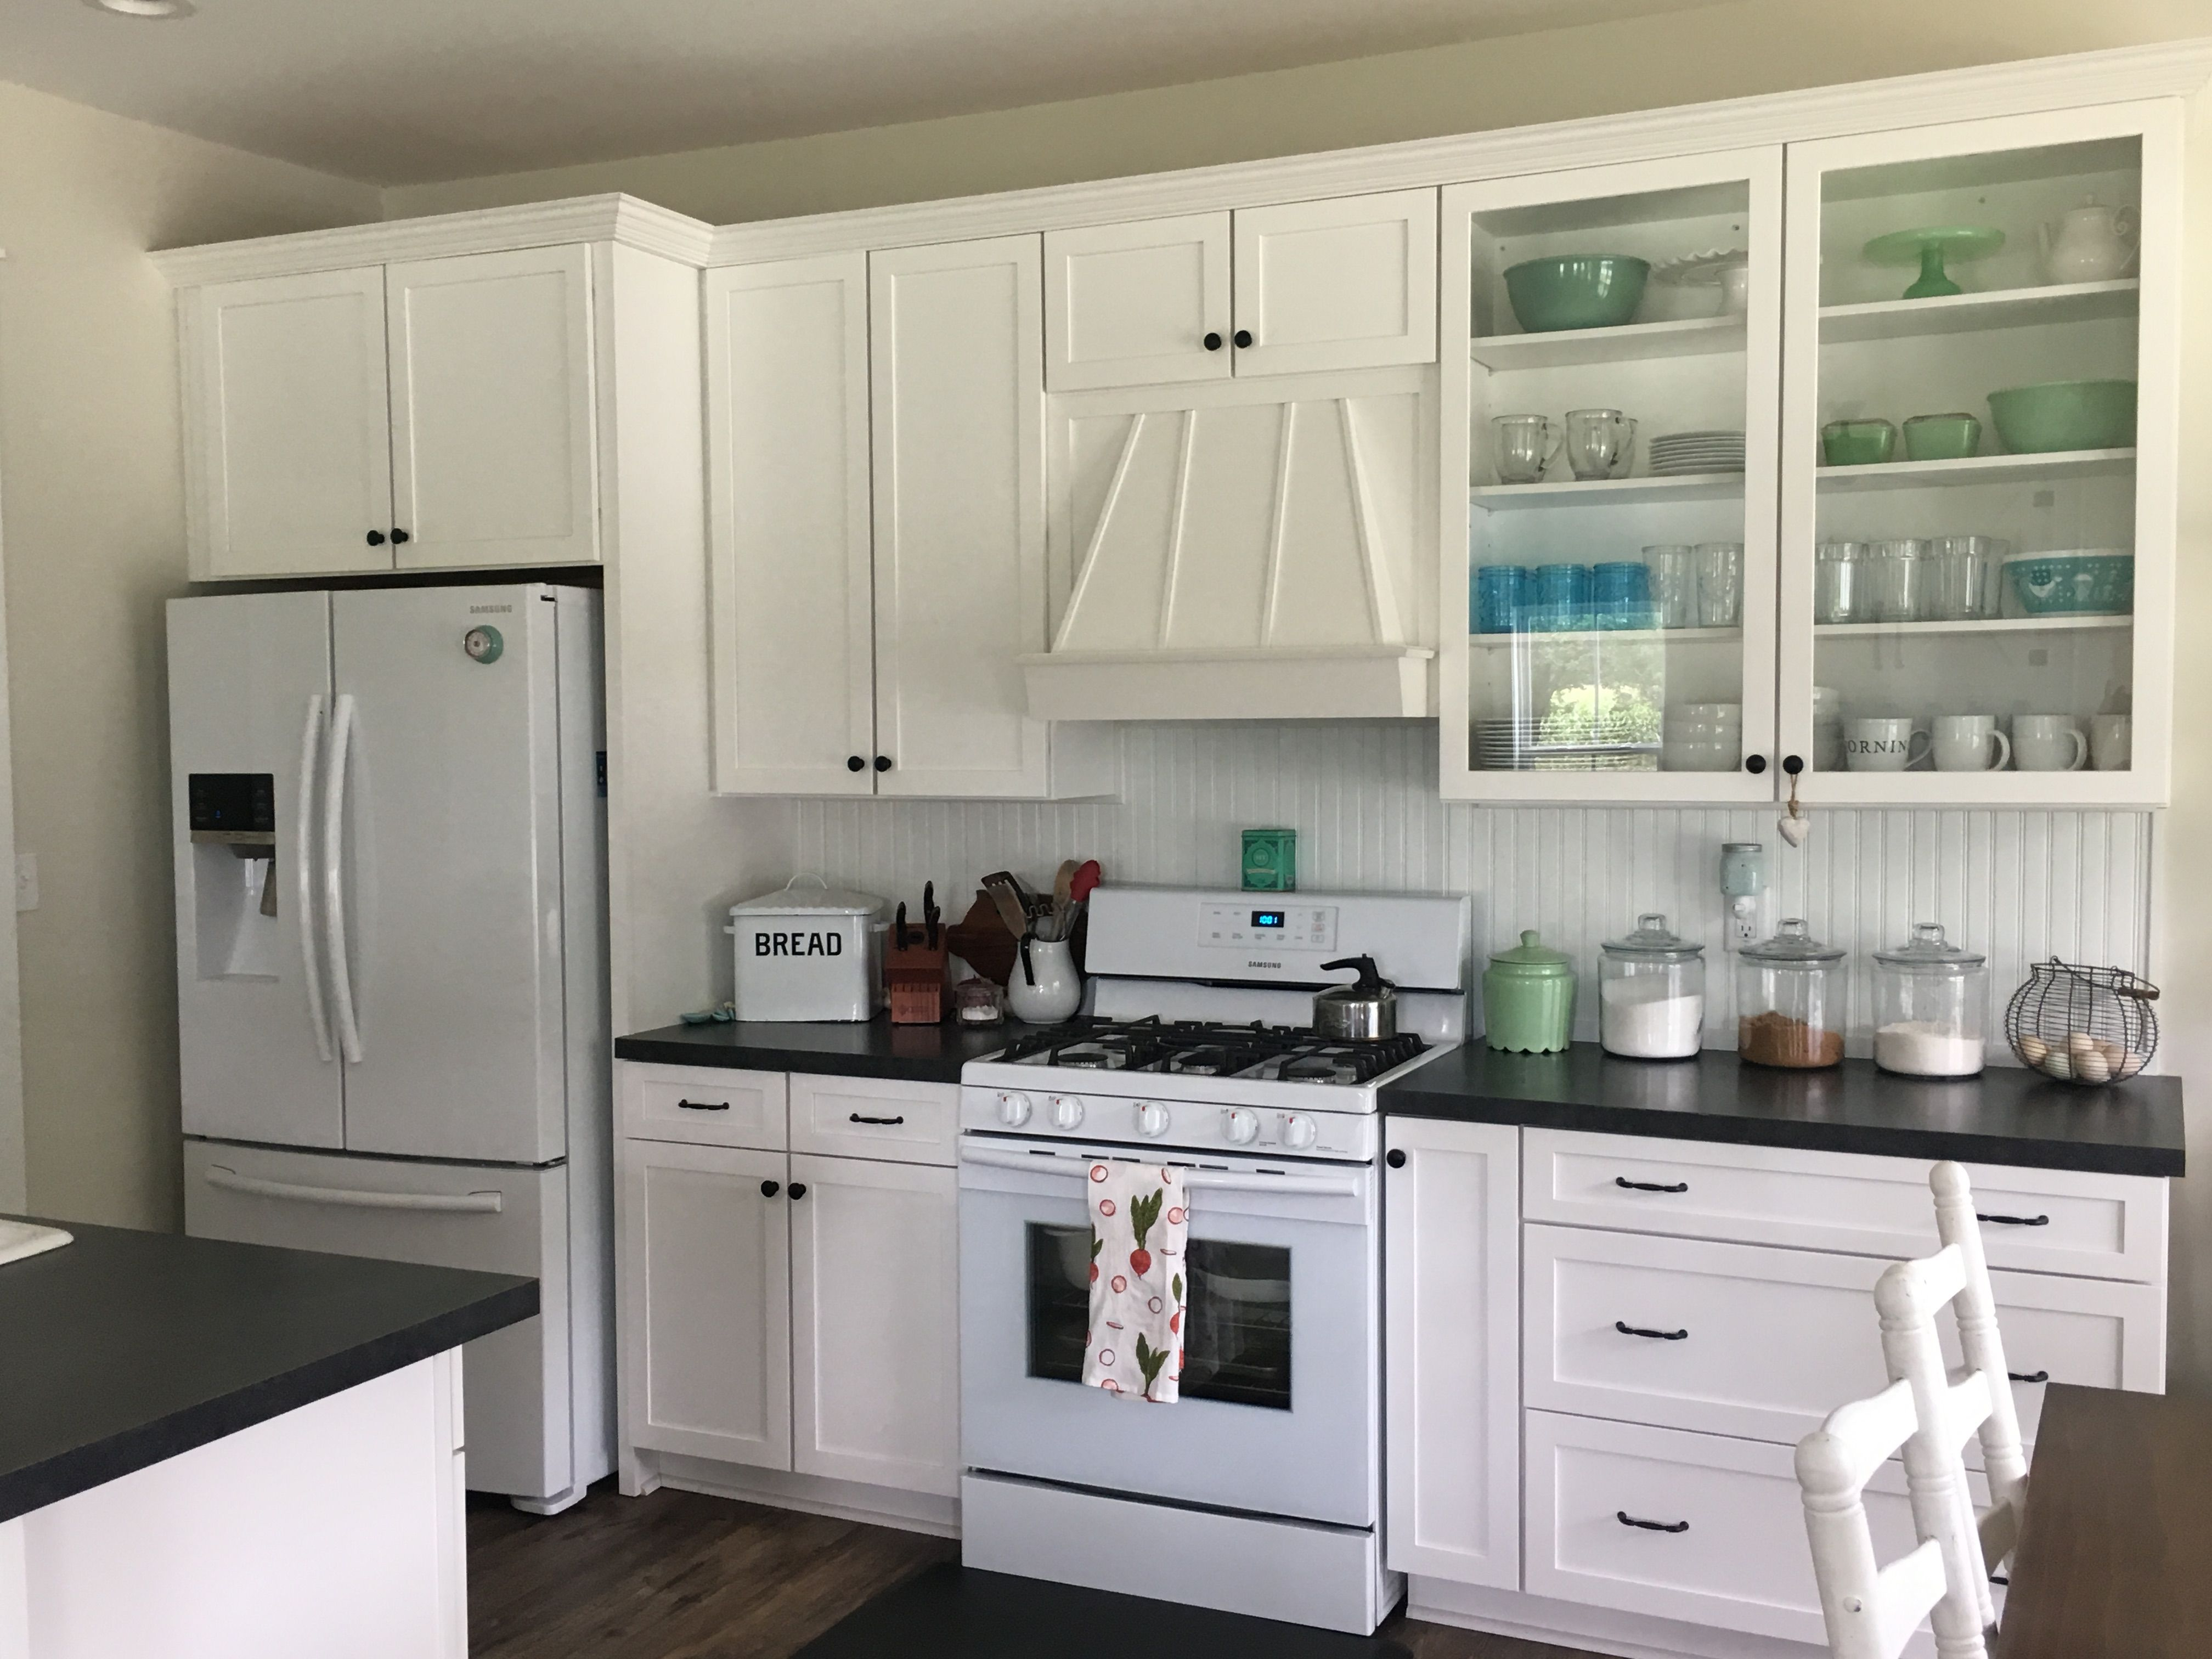 Cottage Farmhouse Style Kitchen Cabinets By Marsh Cabinet Company Kitchen Styling Farmhouse Style House Kitchen